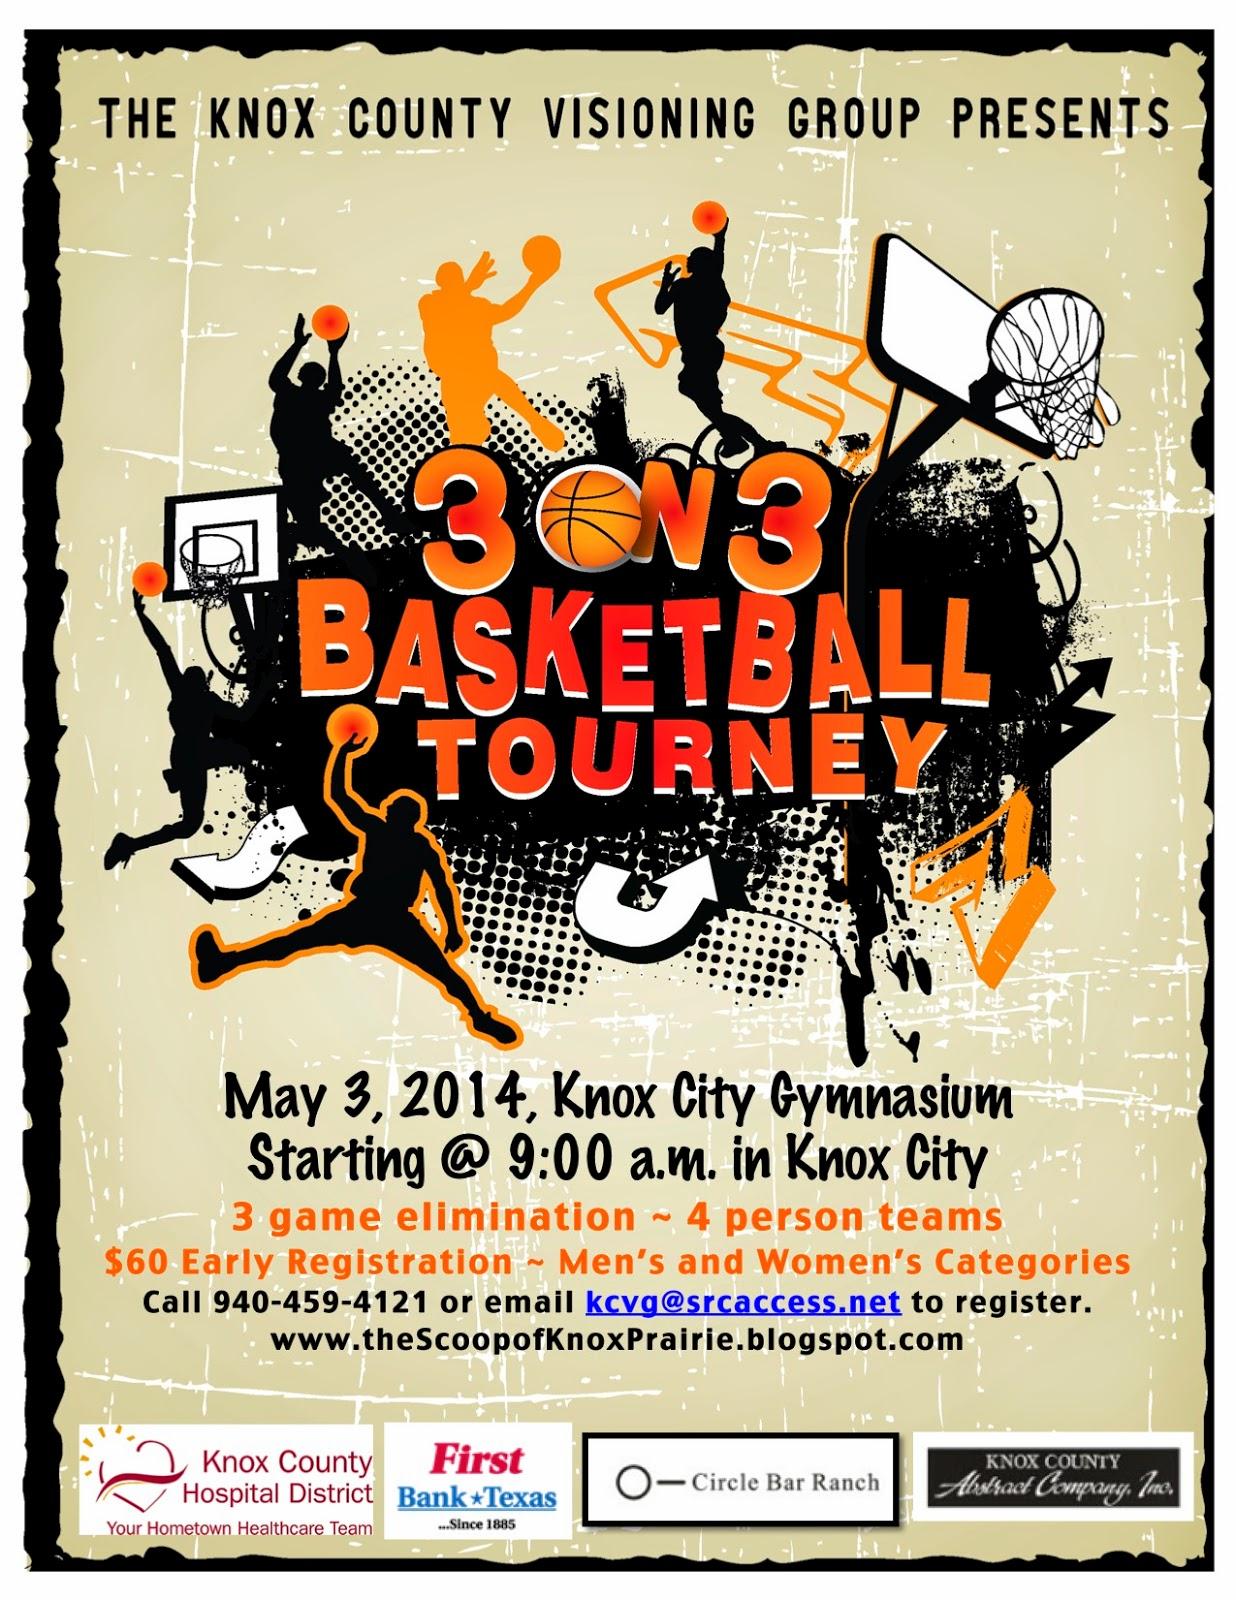 basketball tournament flyer 3 on 3 basketball tournament flyer